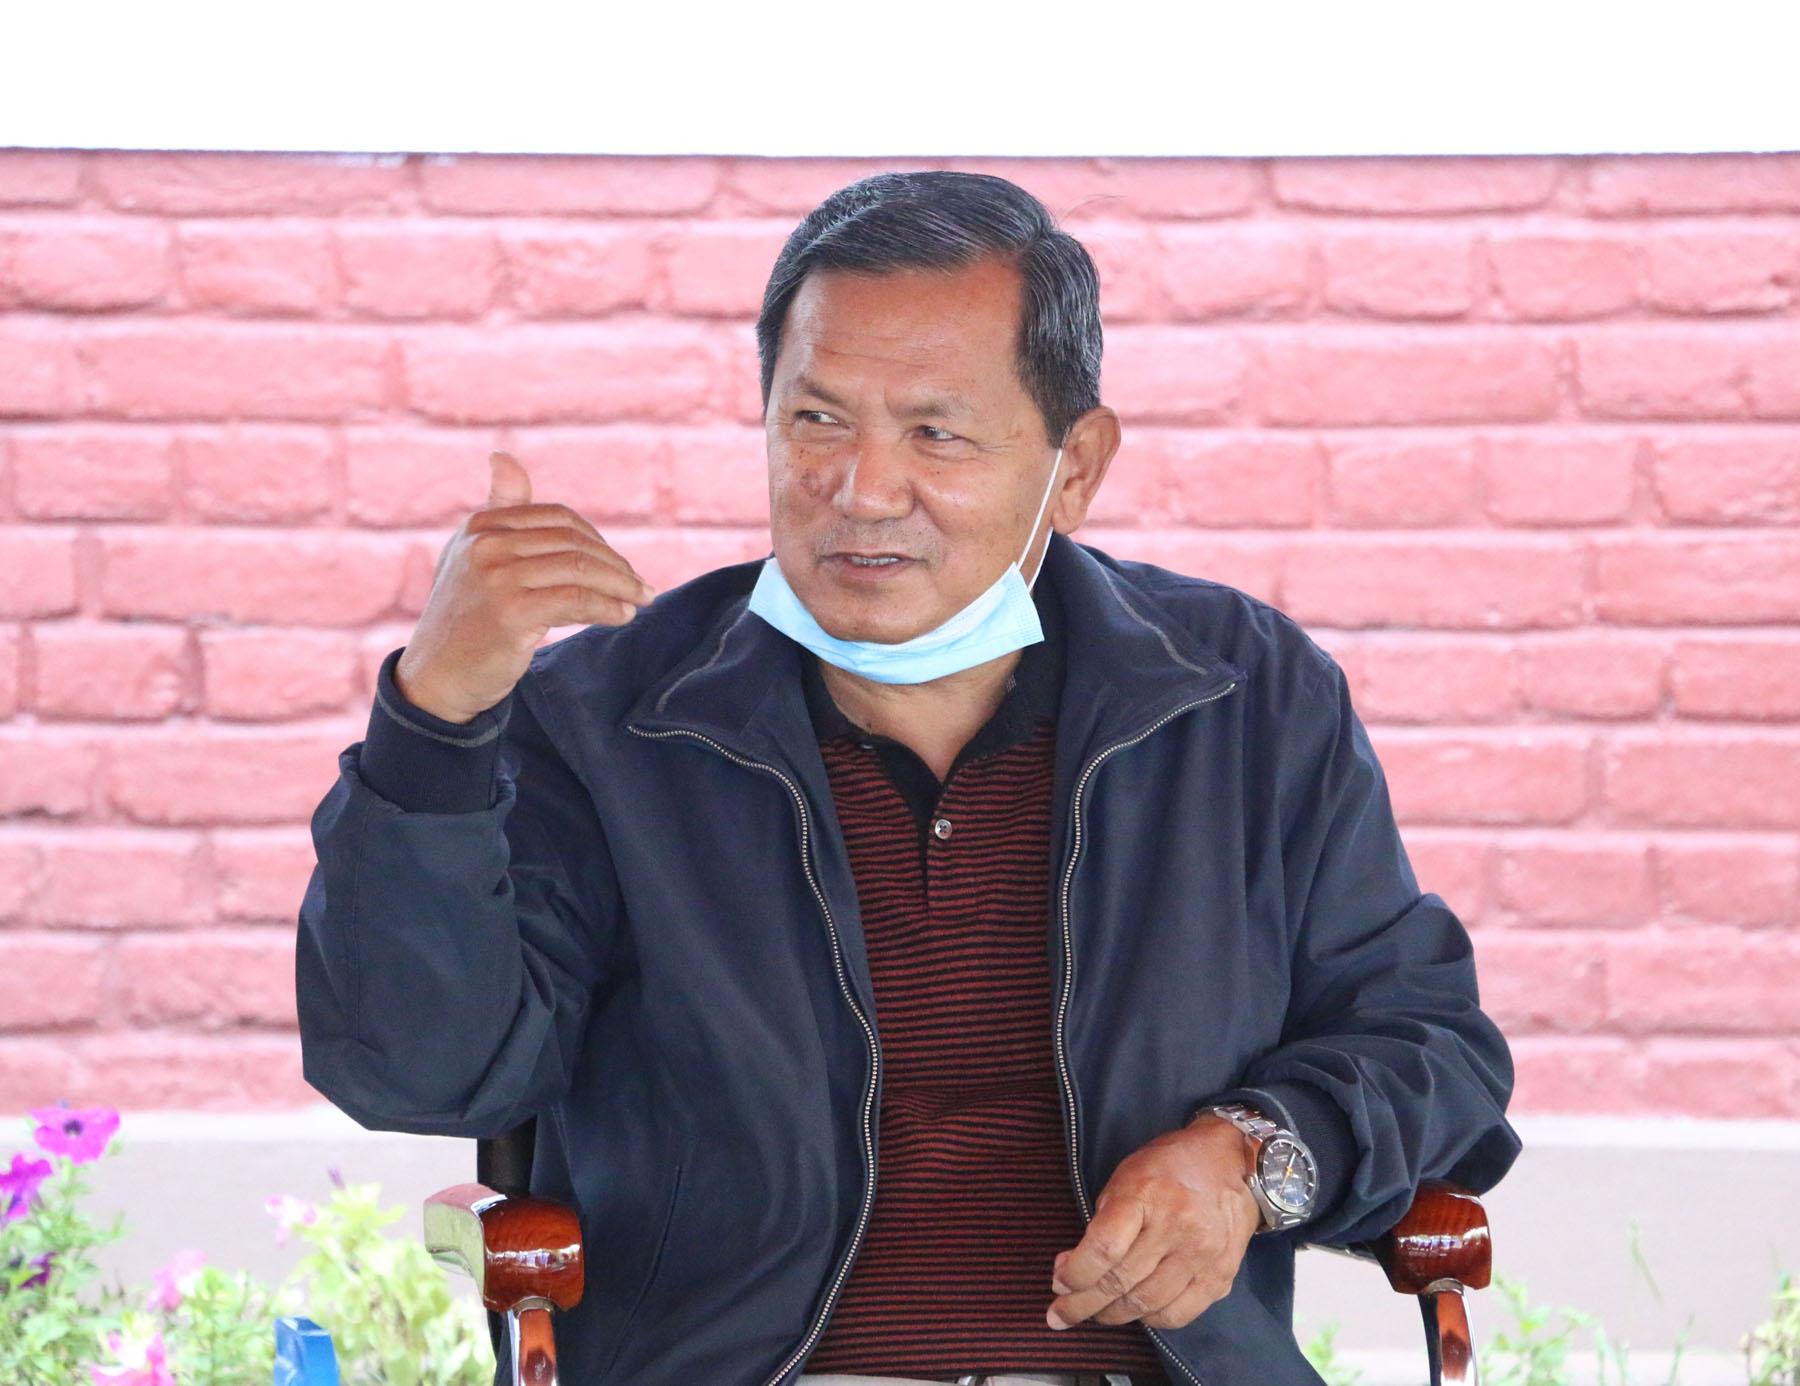 Chief Minster of Gandaki Province Prithvi Subba Gurung addressing the journalists, on Saturday, April 25, 2020. Photo: Bharat Koirala/THT